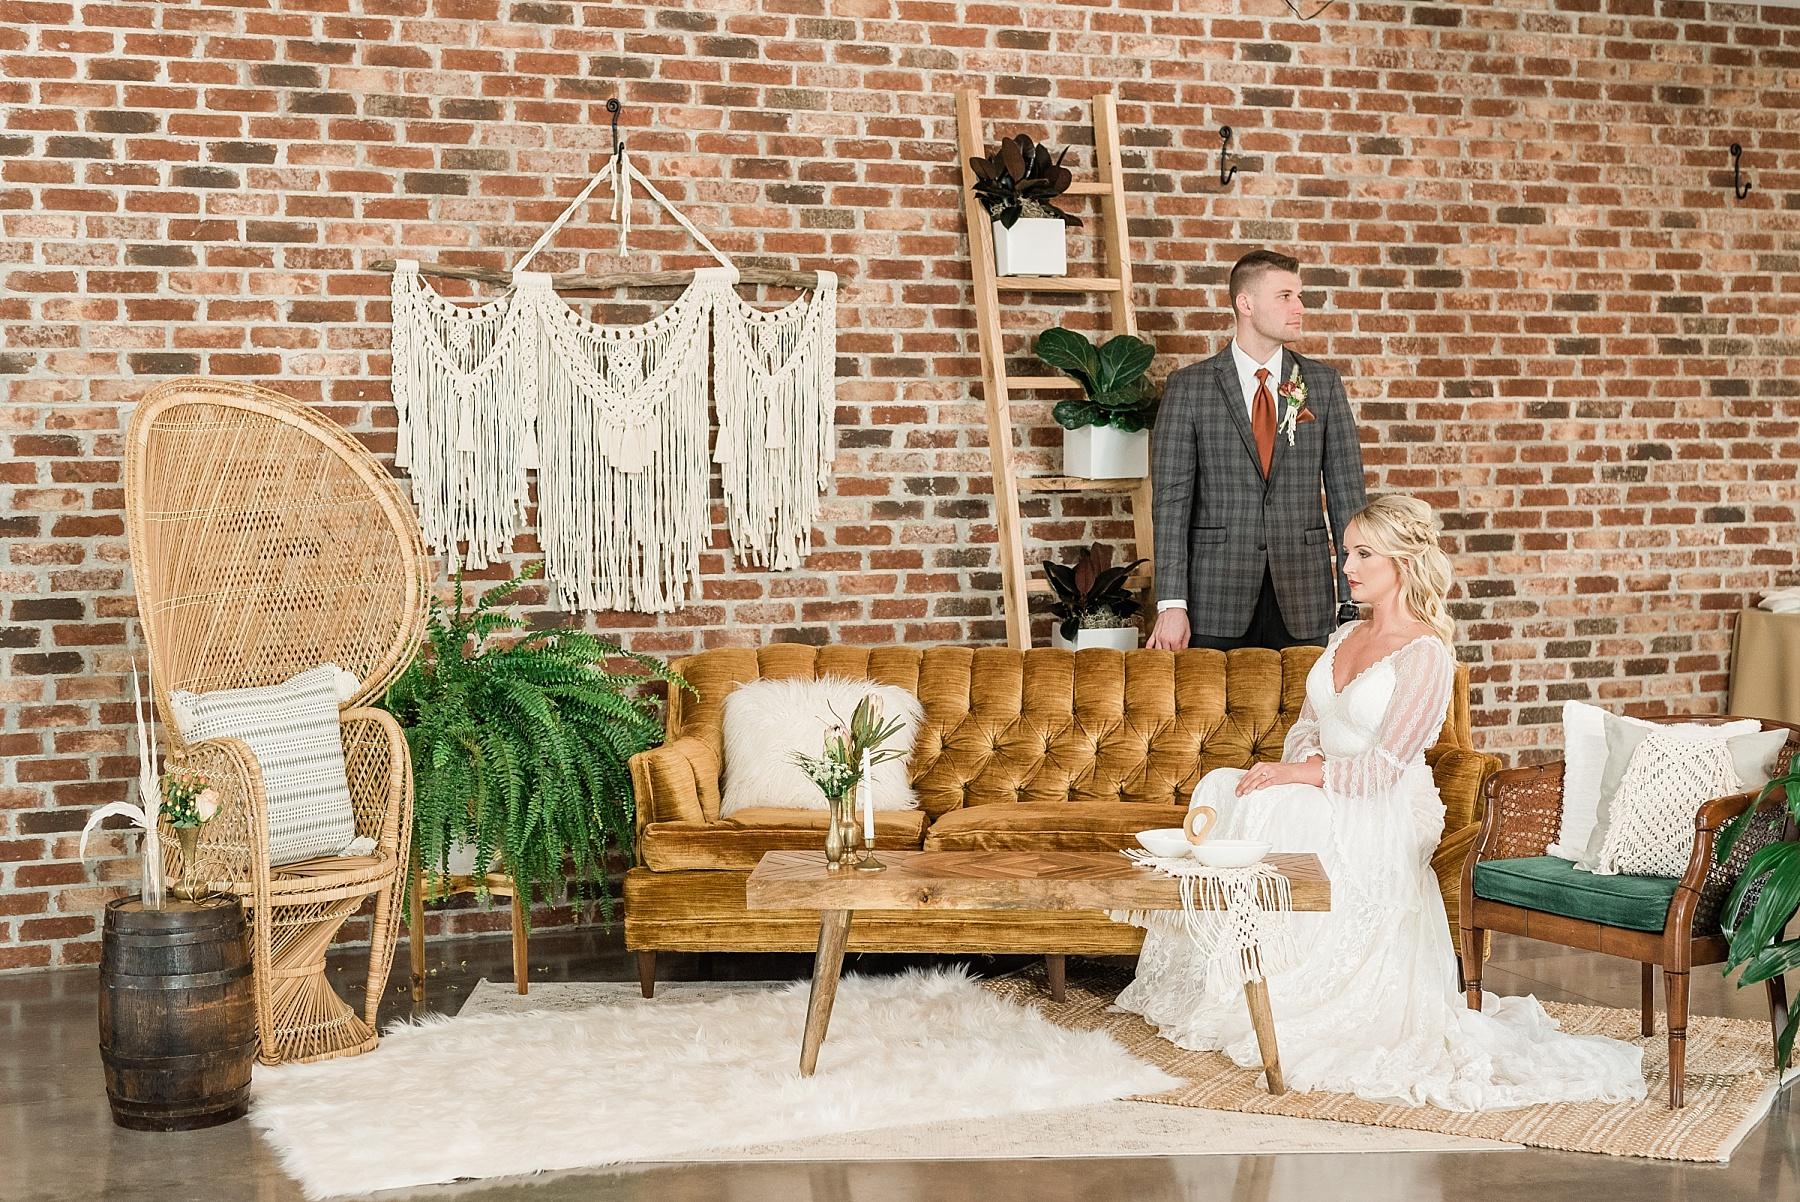 Eclectic Scandinavian Winter Wedding in All White Venue Emerson Fields by Kelsi Kliethermes Photography Best Missouri and Maui Wedding Photographer_0019.jpg